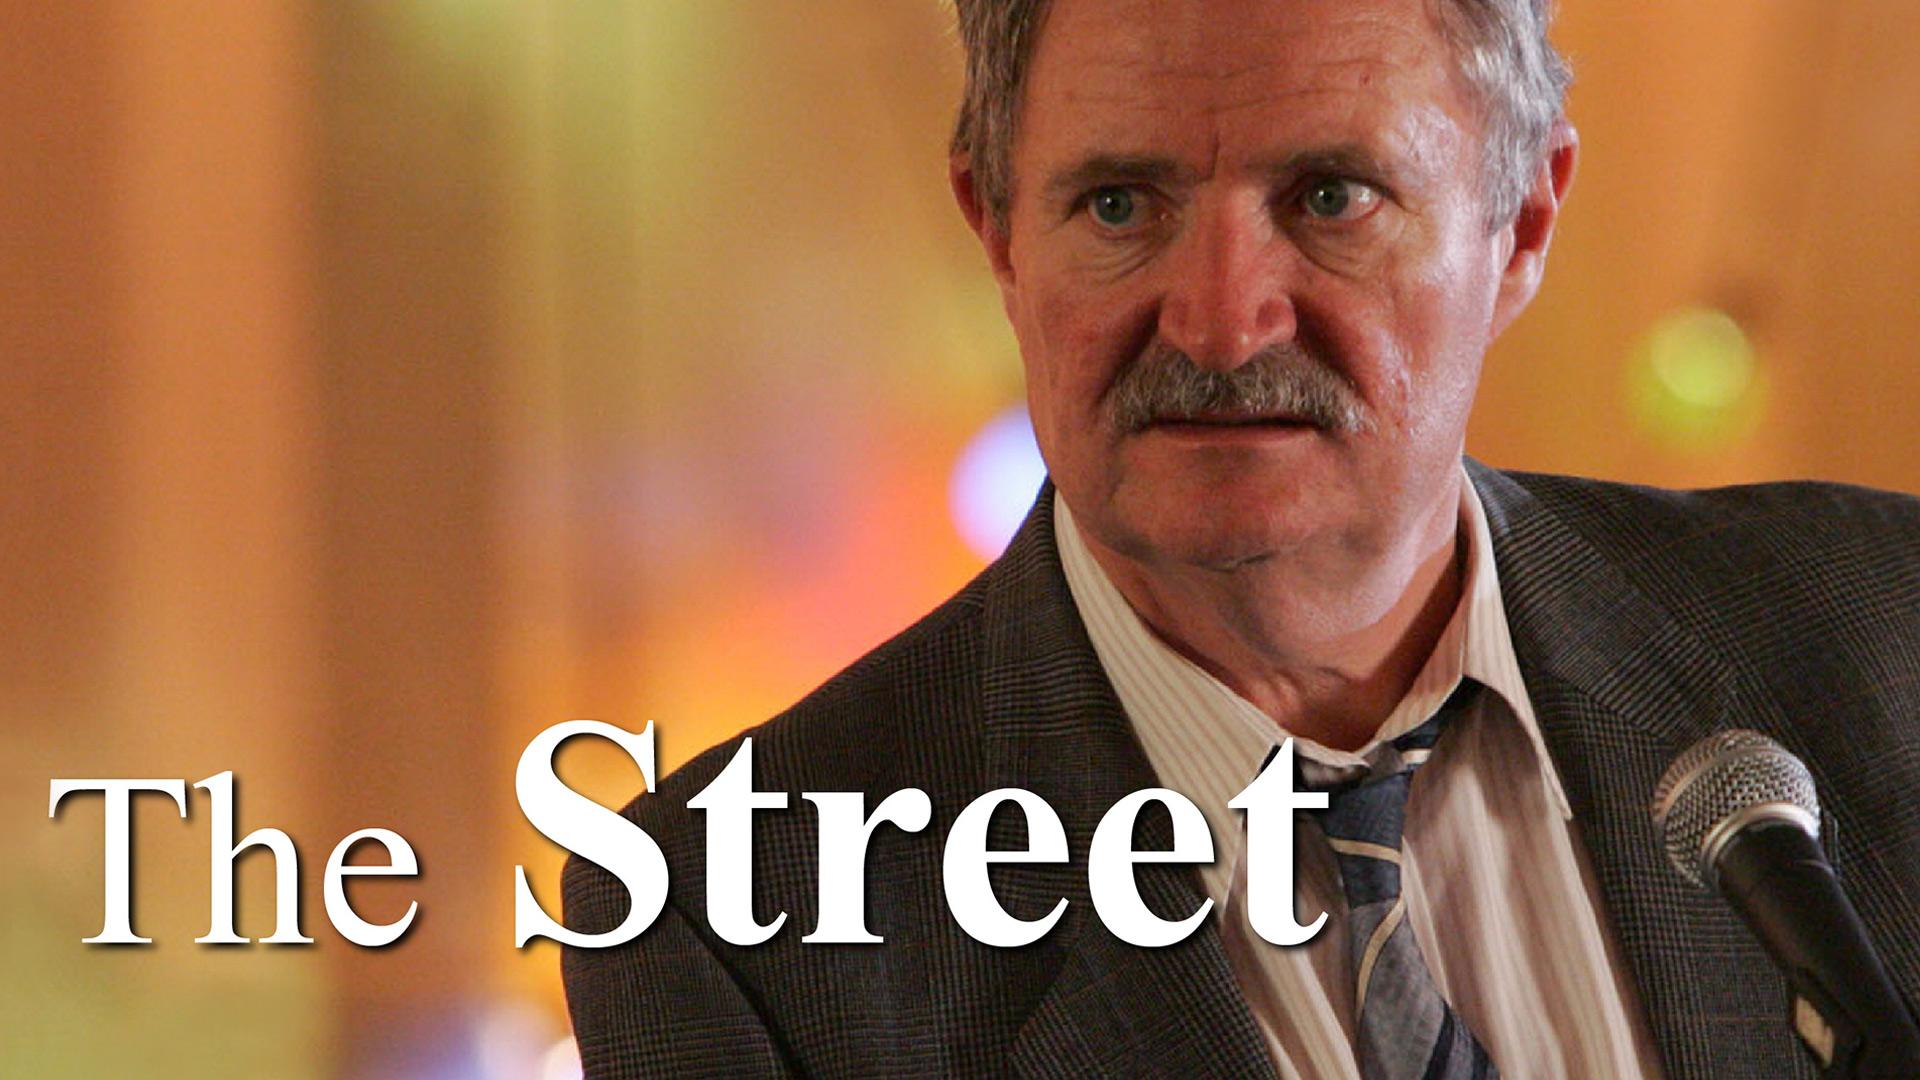 The Street, Season 1